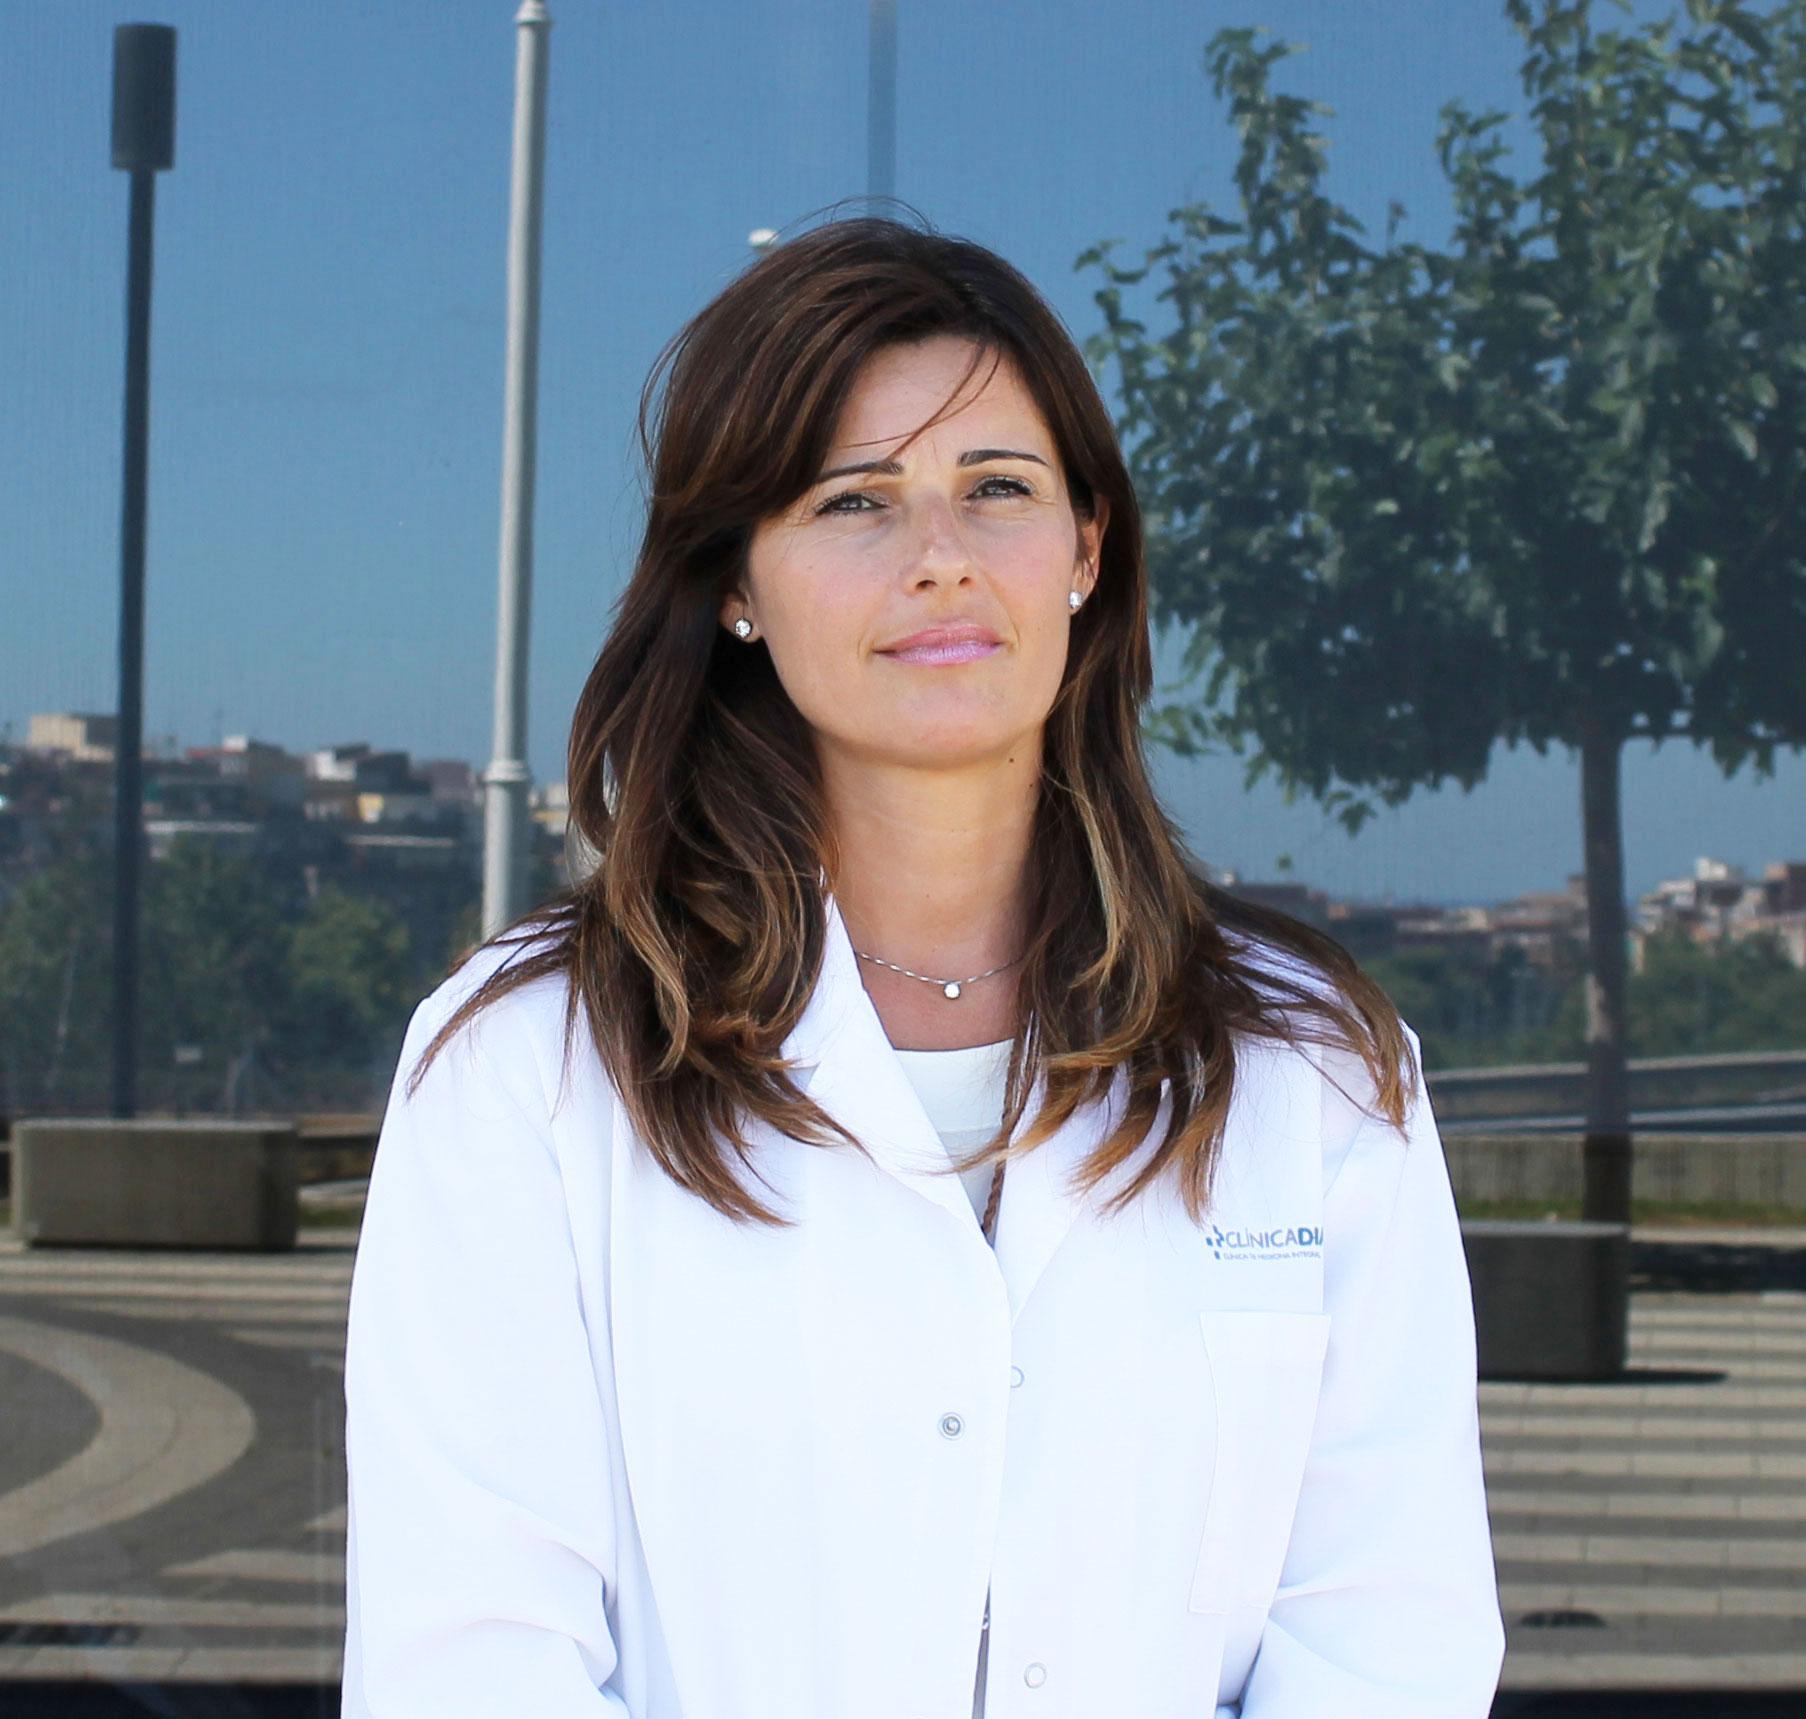 Dra. Azucena Fernández Huélamo